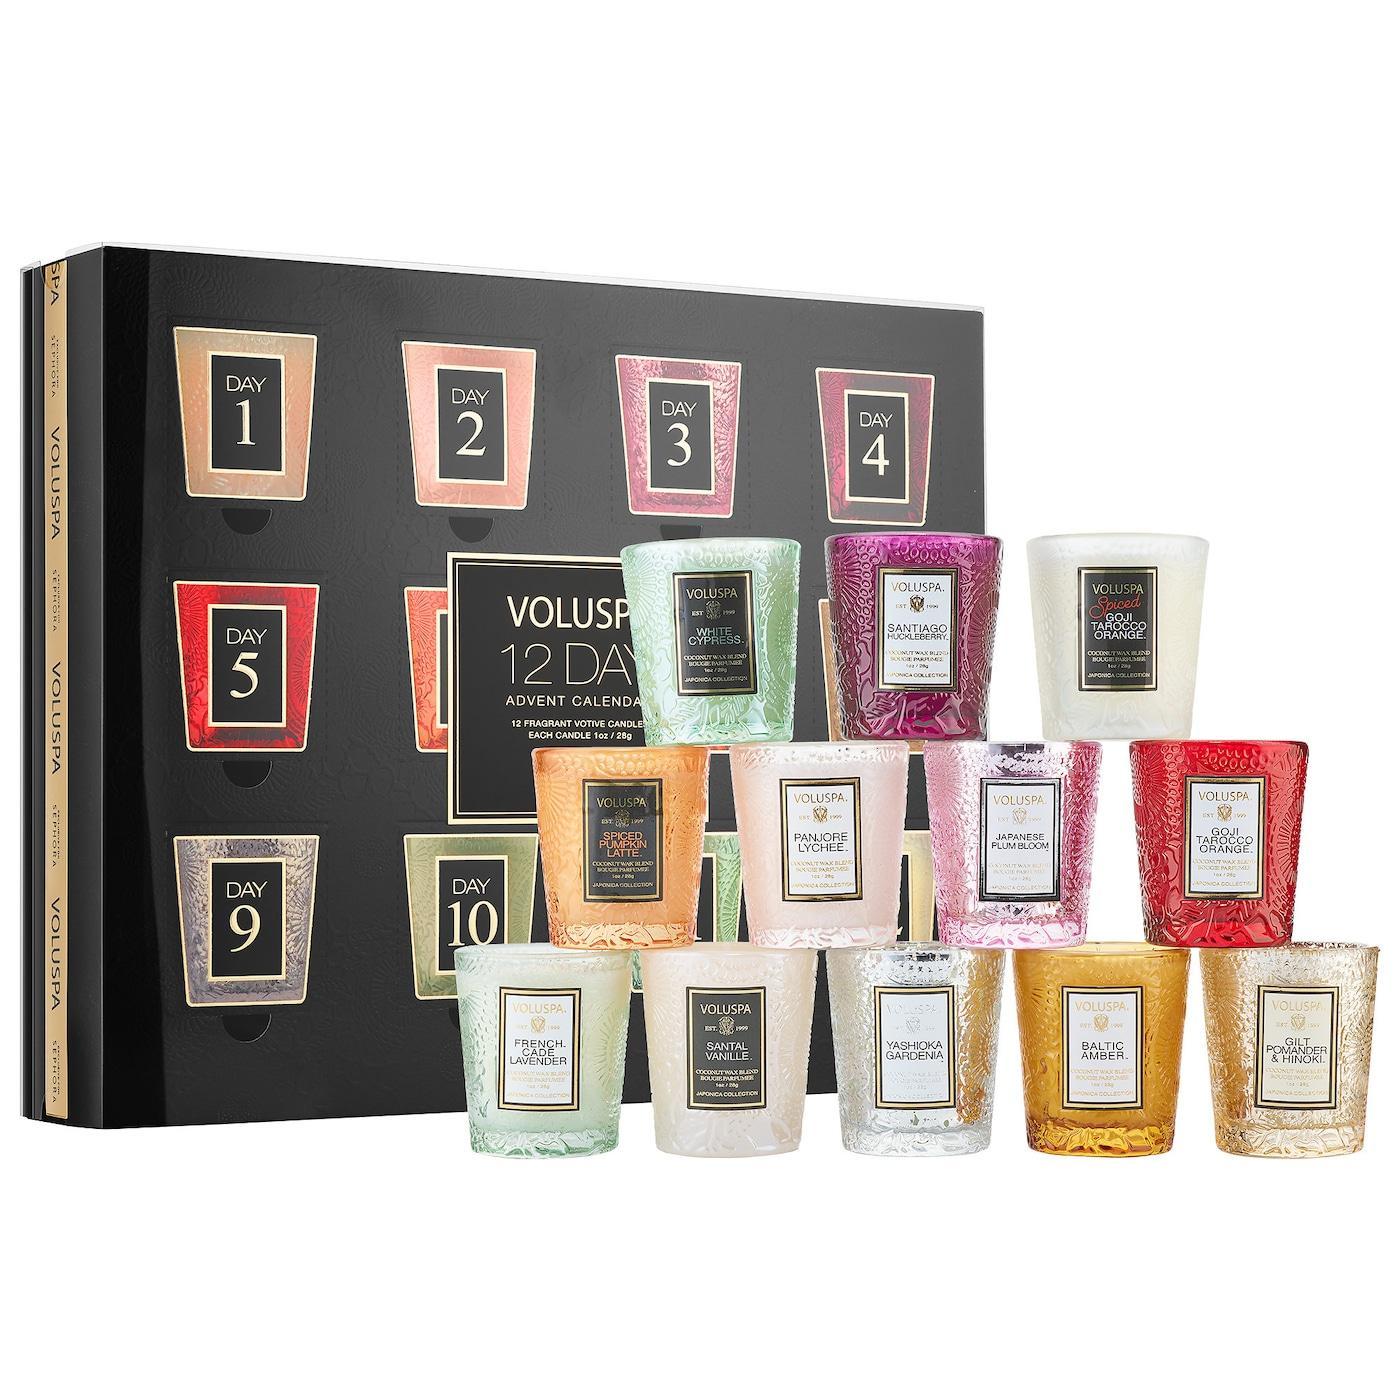 VOLUSPA Advent Calendar Mini Candle Set – On Sale Now